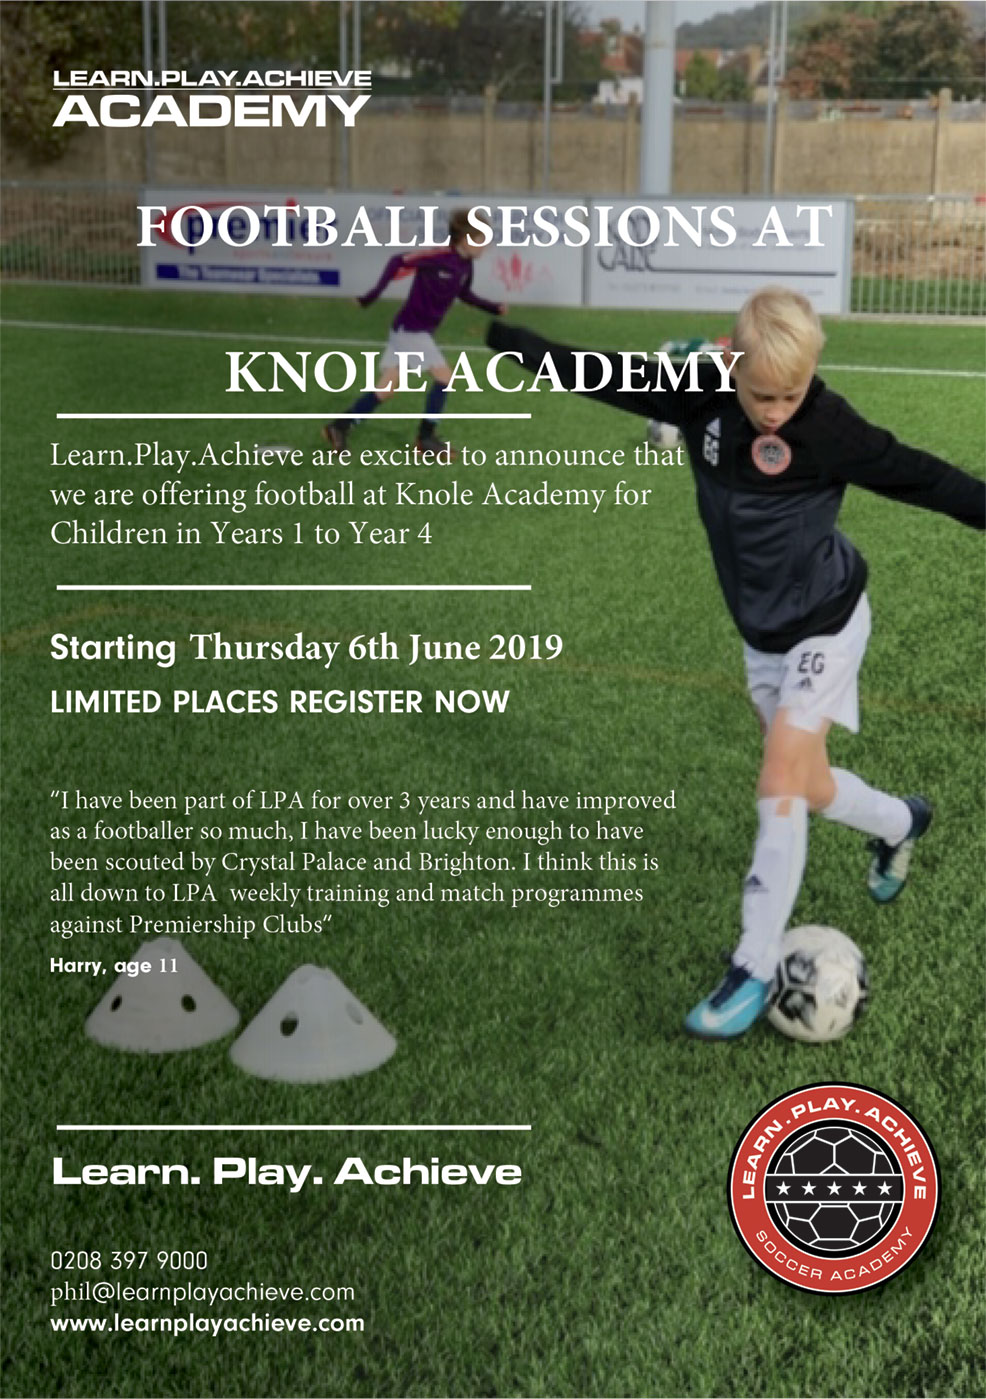 https://www.learnplayachieve.com/wp-content/uploads/2019/05/Kent-sessions-1.jpg